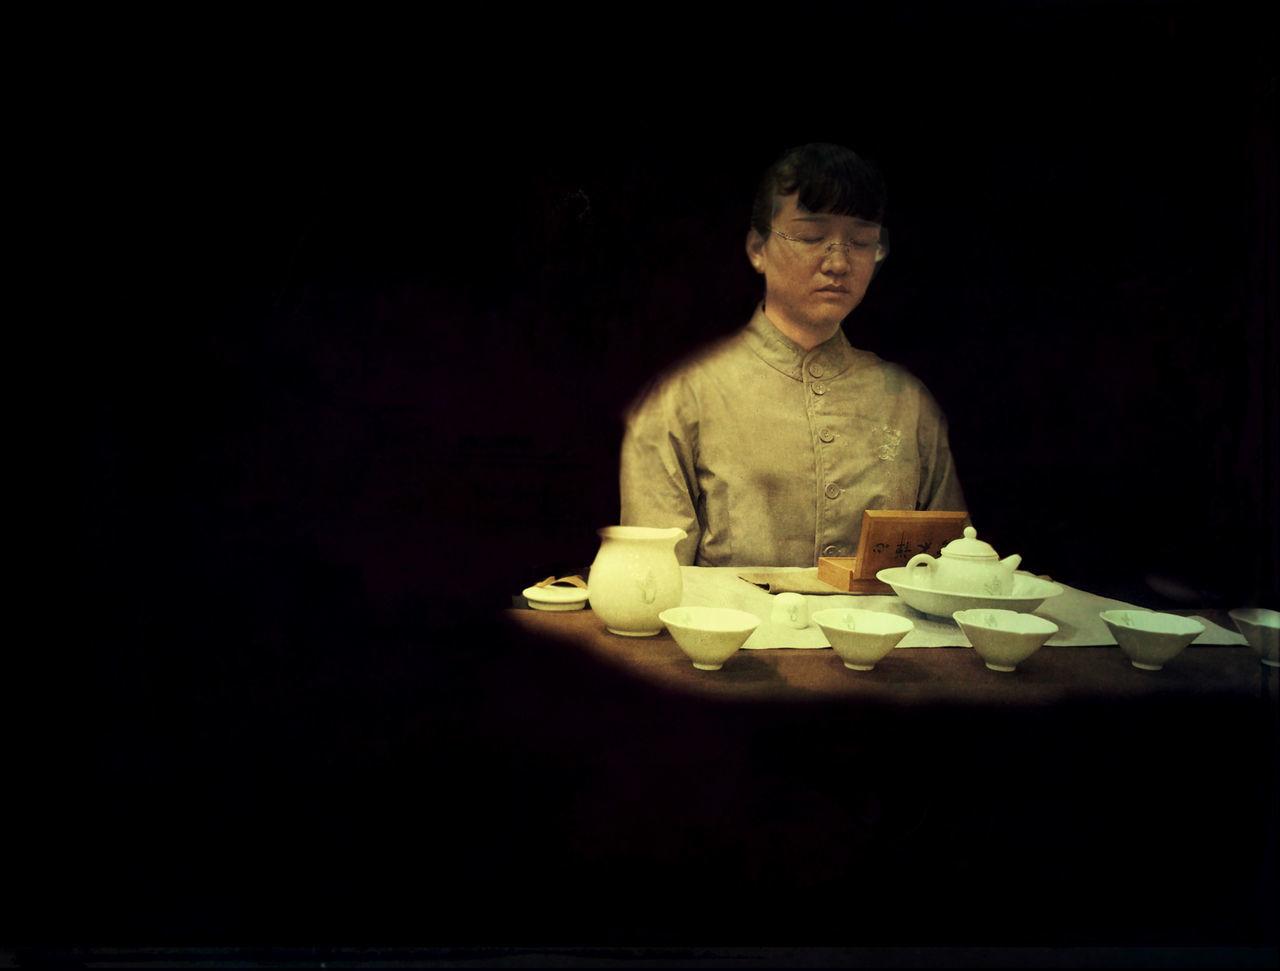 Sitzen in tiefer Sammlung Black Background Cap Of Tea Meditation Place One Person People Studio Shot Table Tea Ceremony